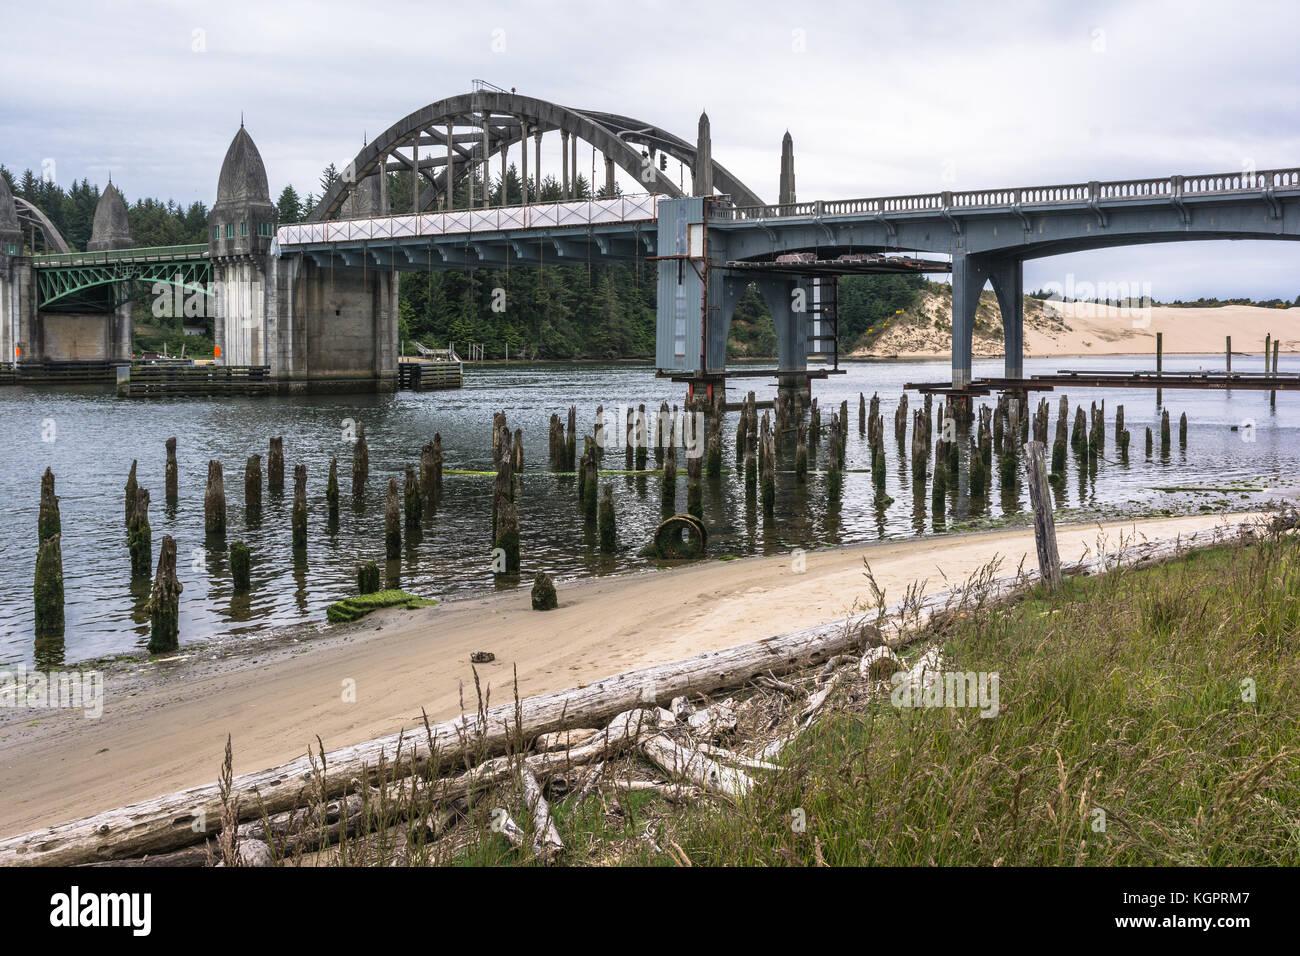 Florence, Oregon, USA - Juni 7, 2017: Die Brücke über den siuslaw River Stockbild